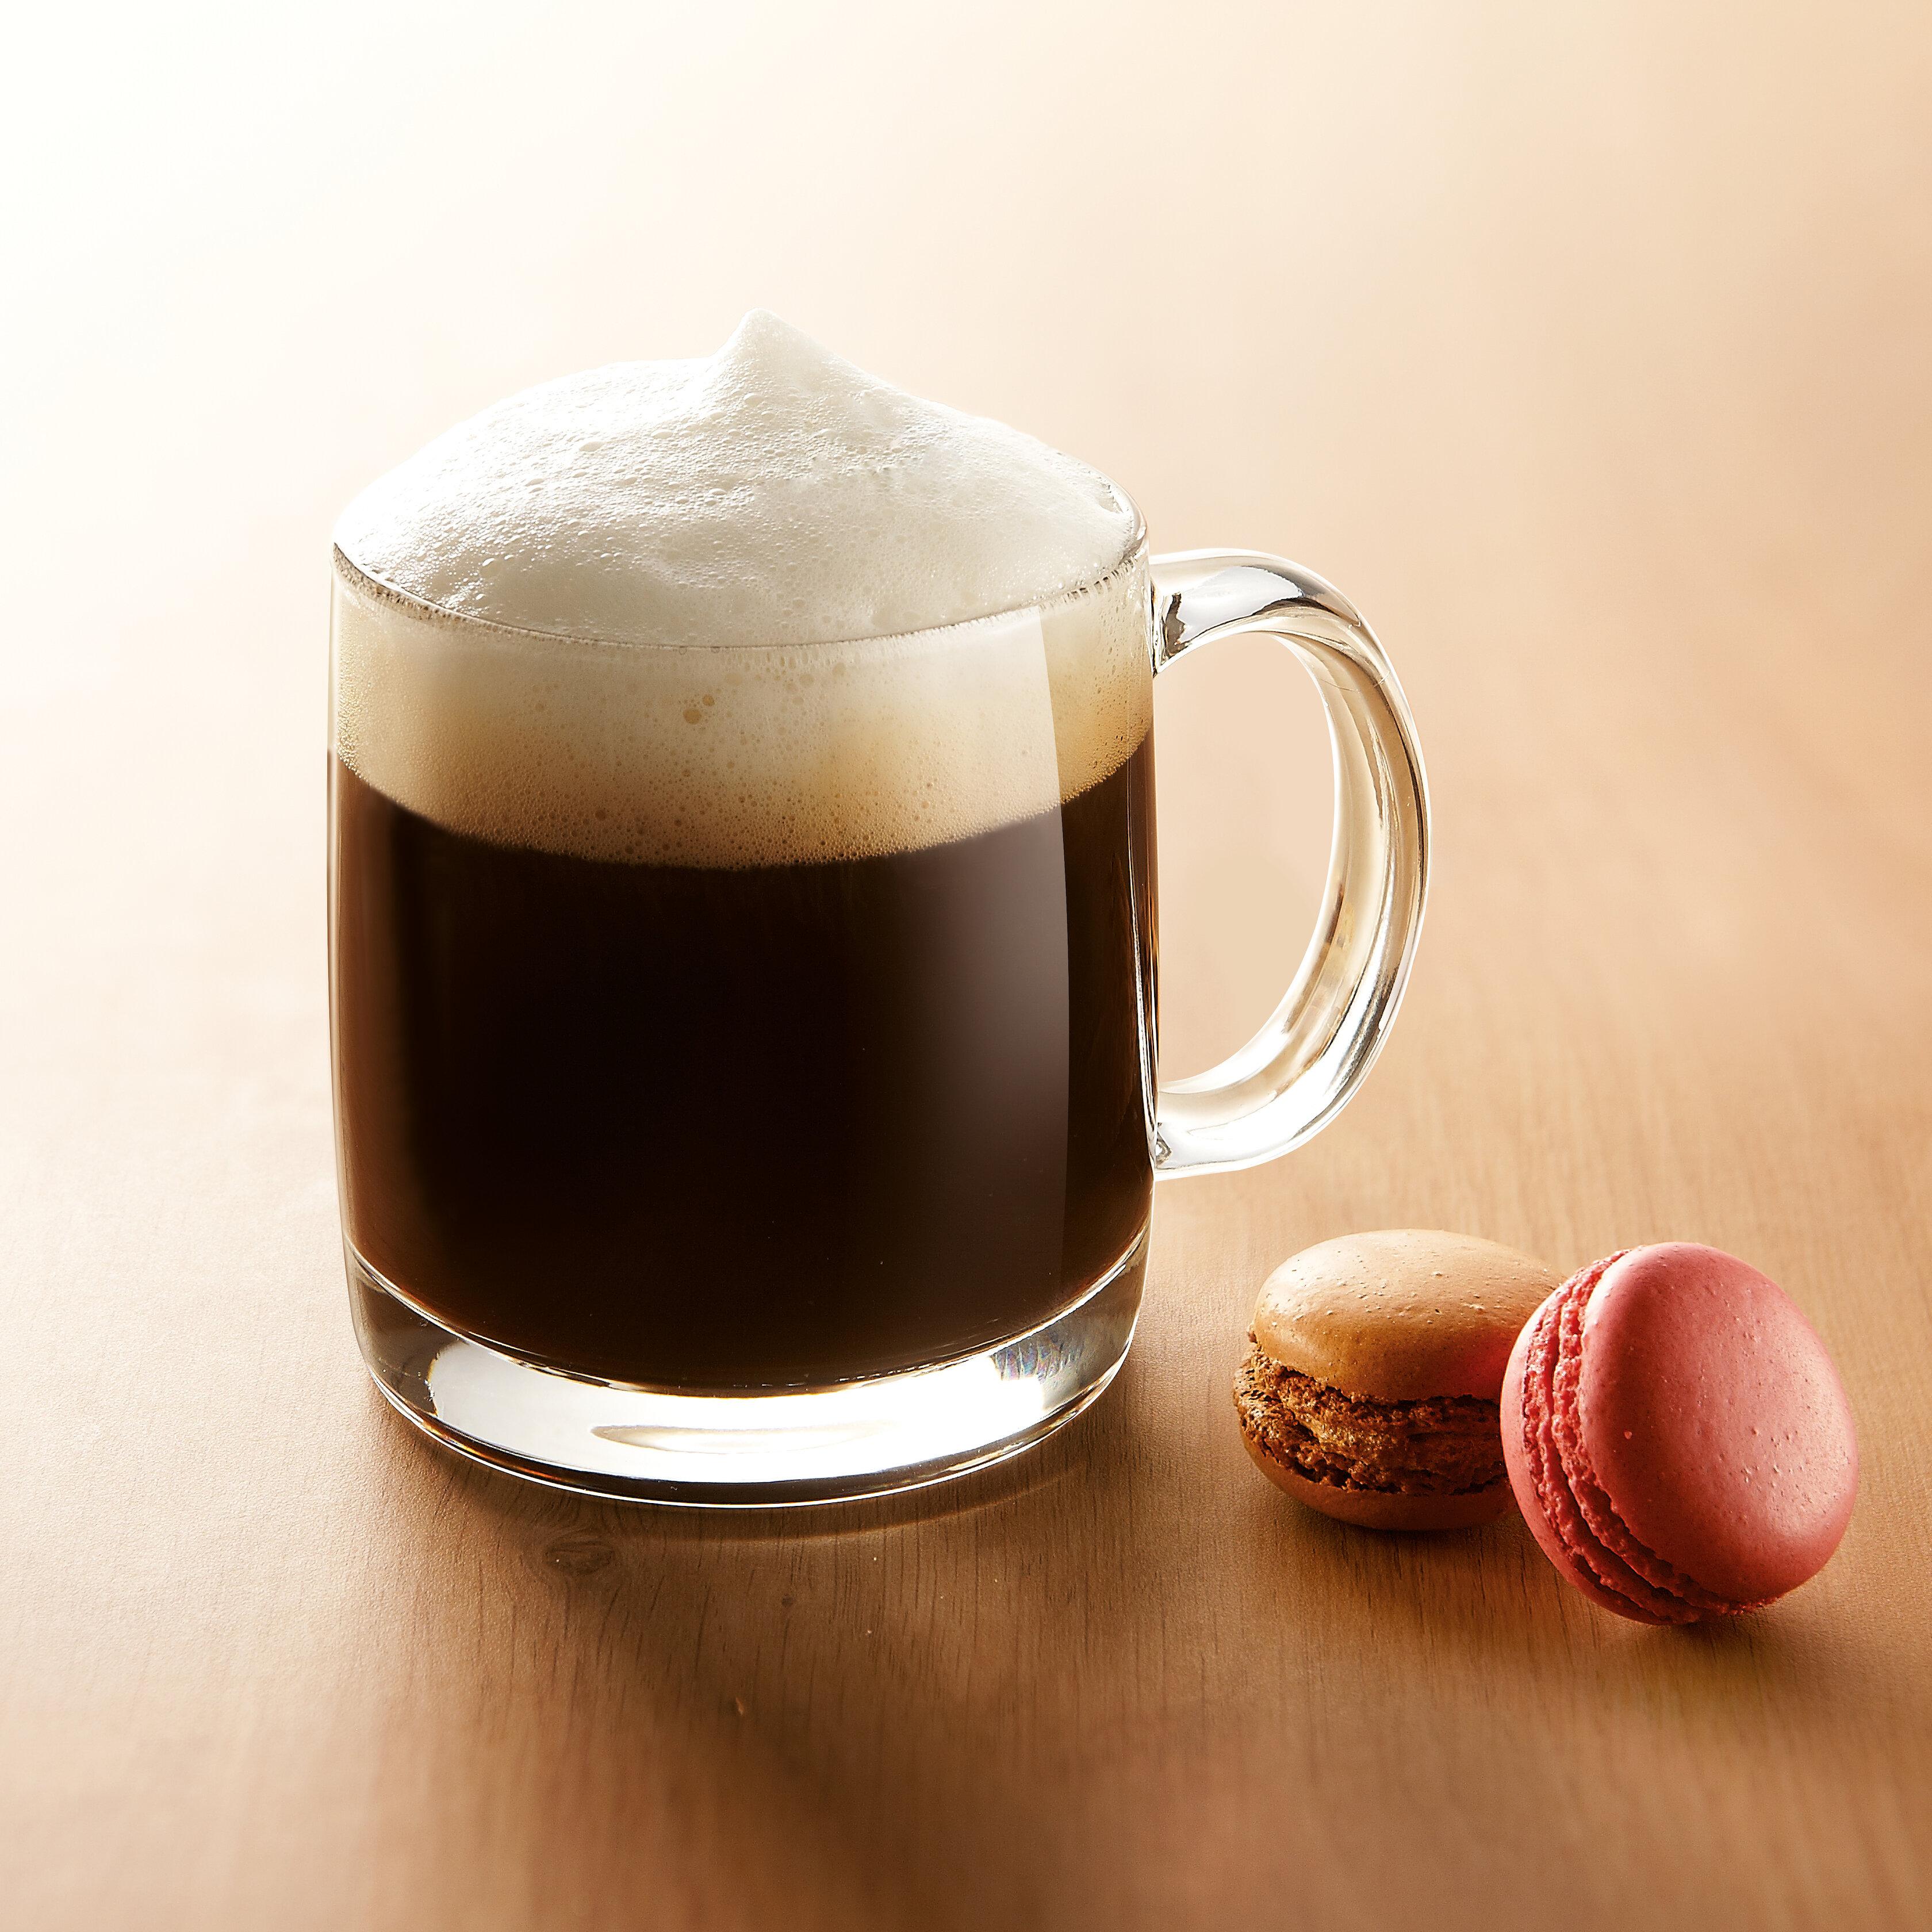 Clear Mugs Teacups From 30 Until 11 20 Wayfair Wayfair